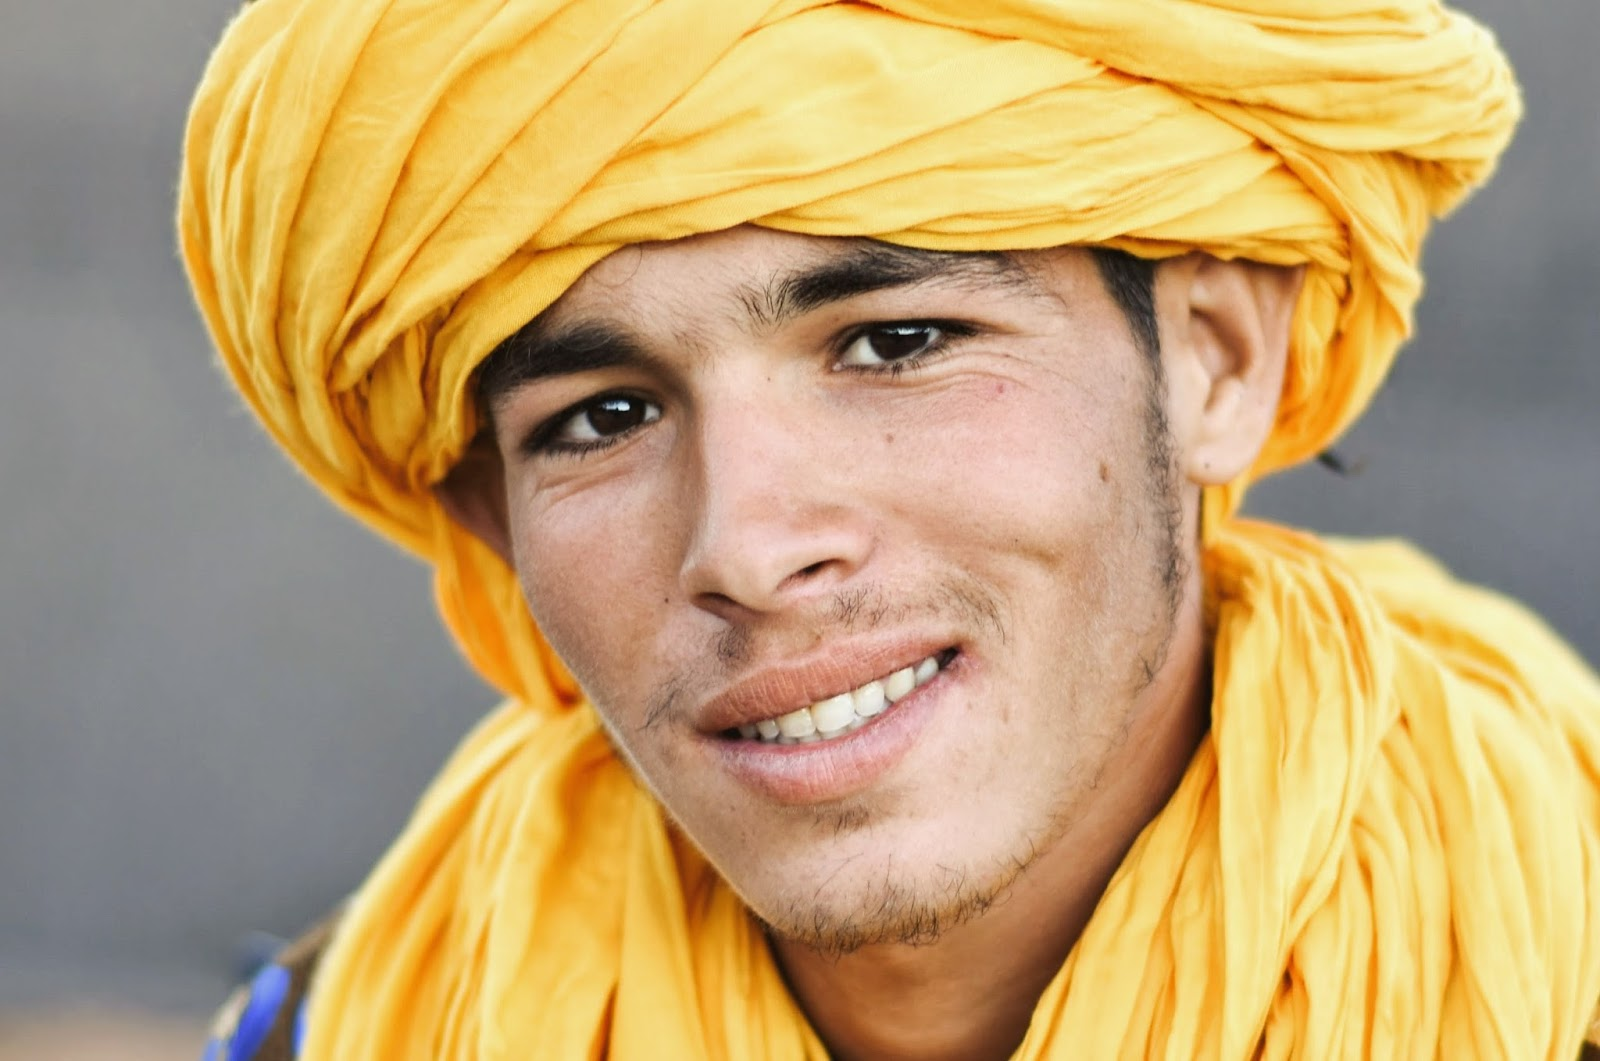 Brahim | the berber smile of sahara | people on my way